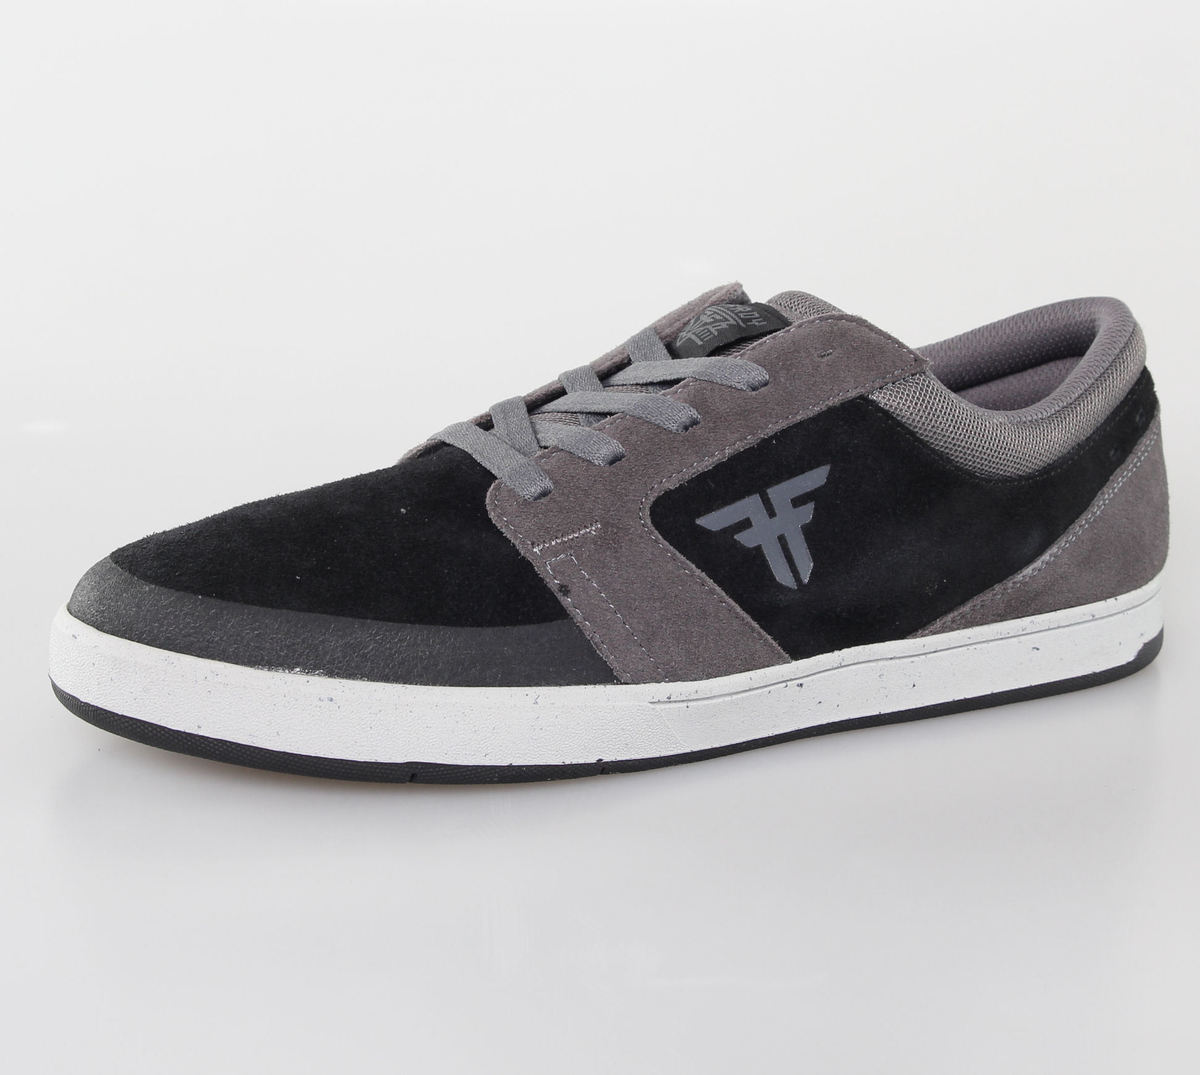 boty pánské FALLEN - Torch Ash - Grey/Flat Black - 41070089